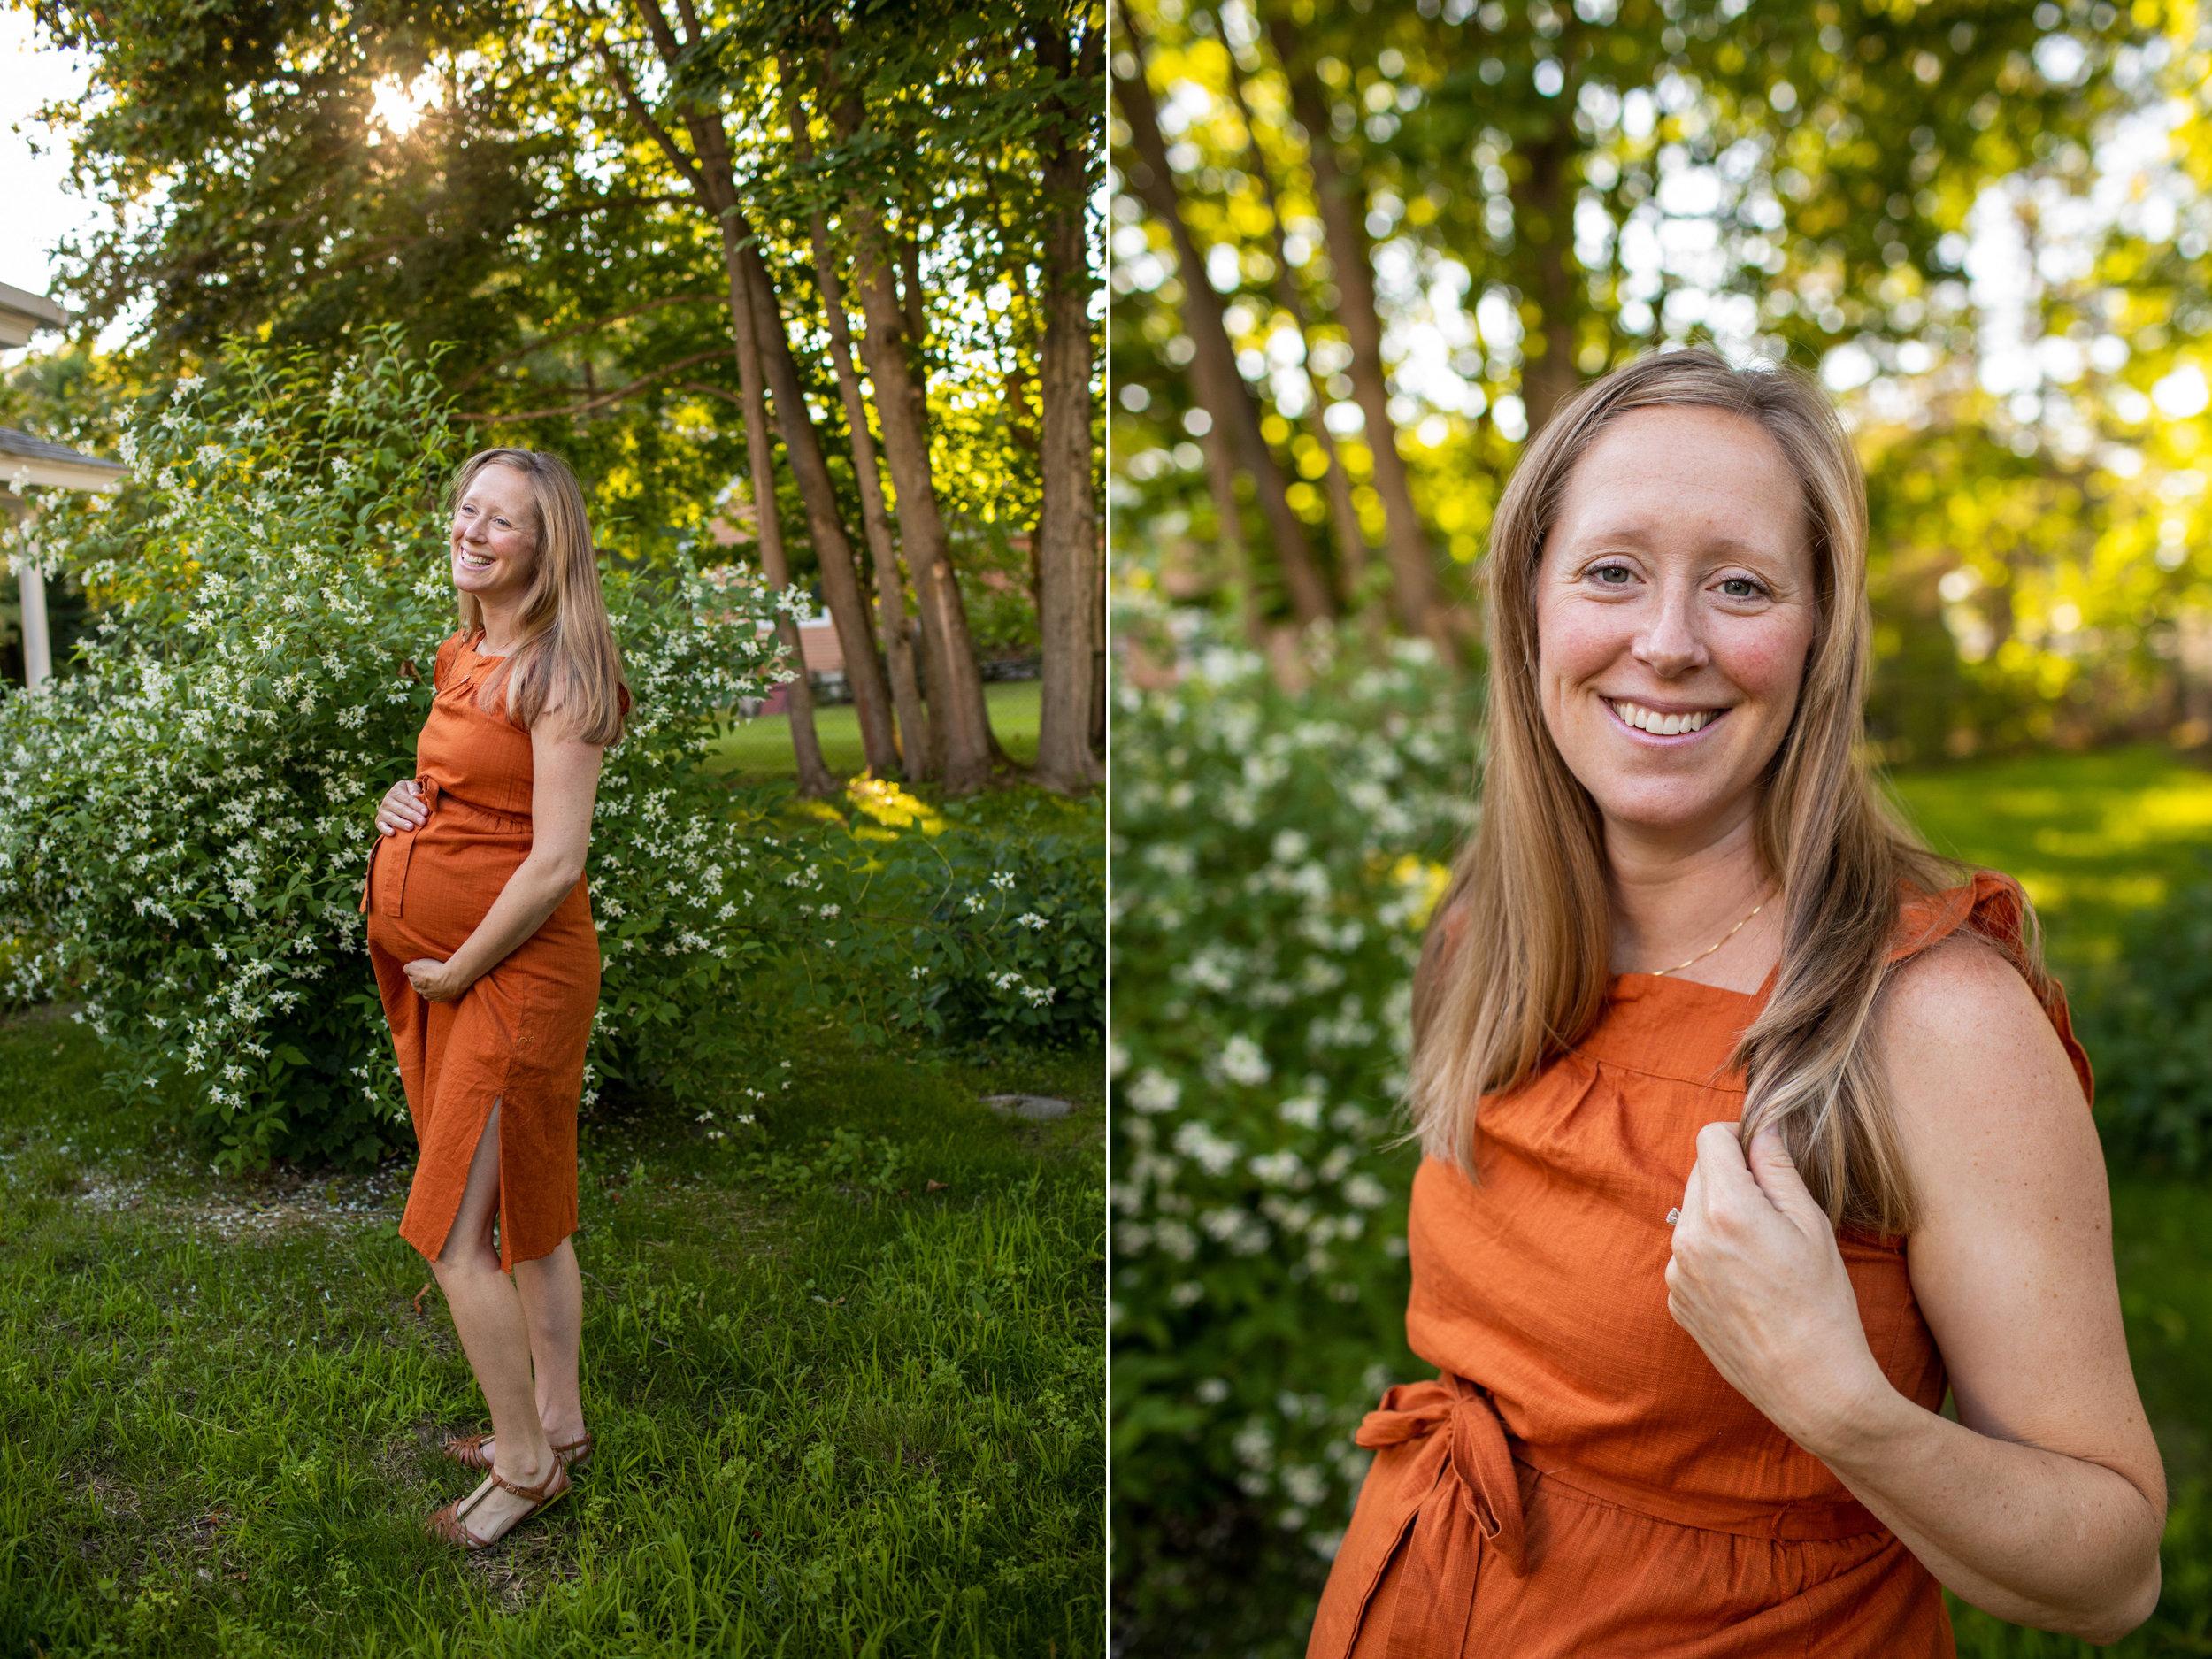 maine-maternity-photographer-stepheneycollins -1c.jpg